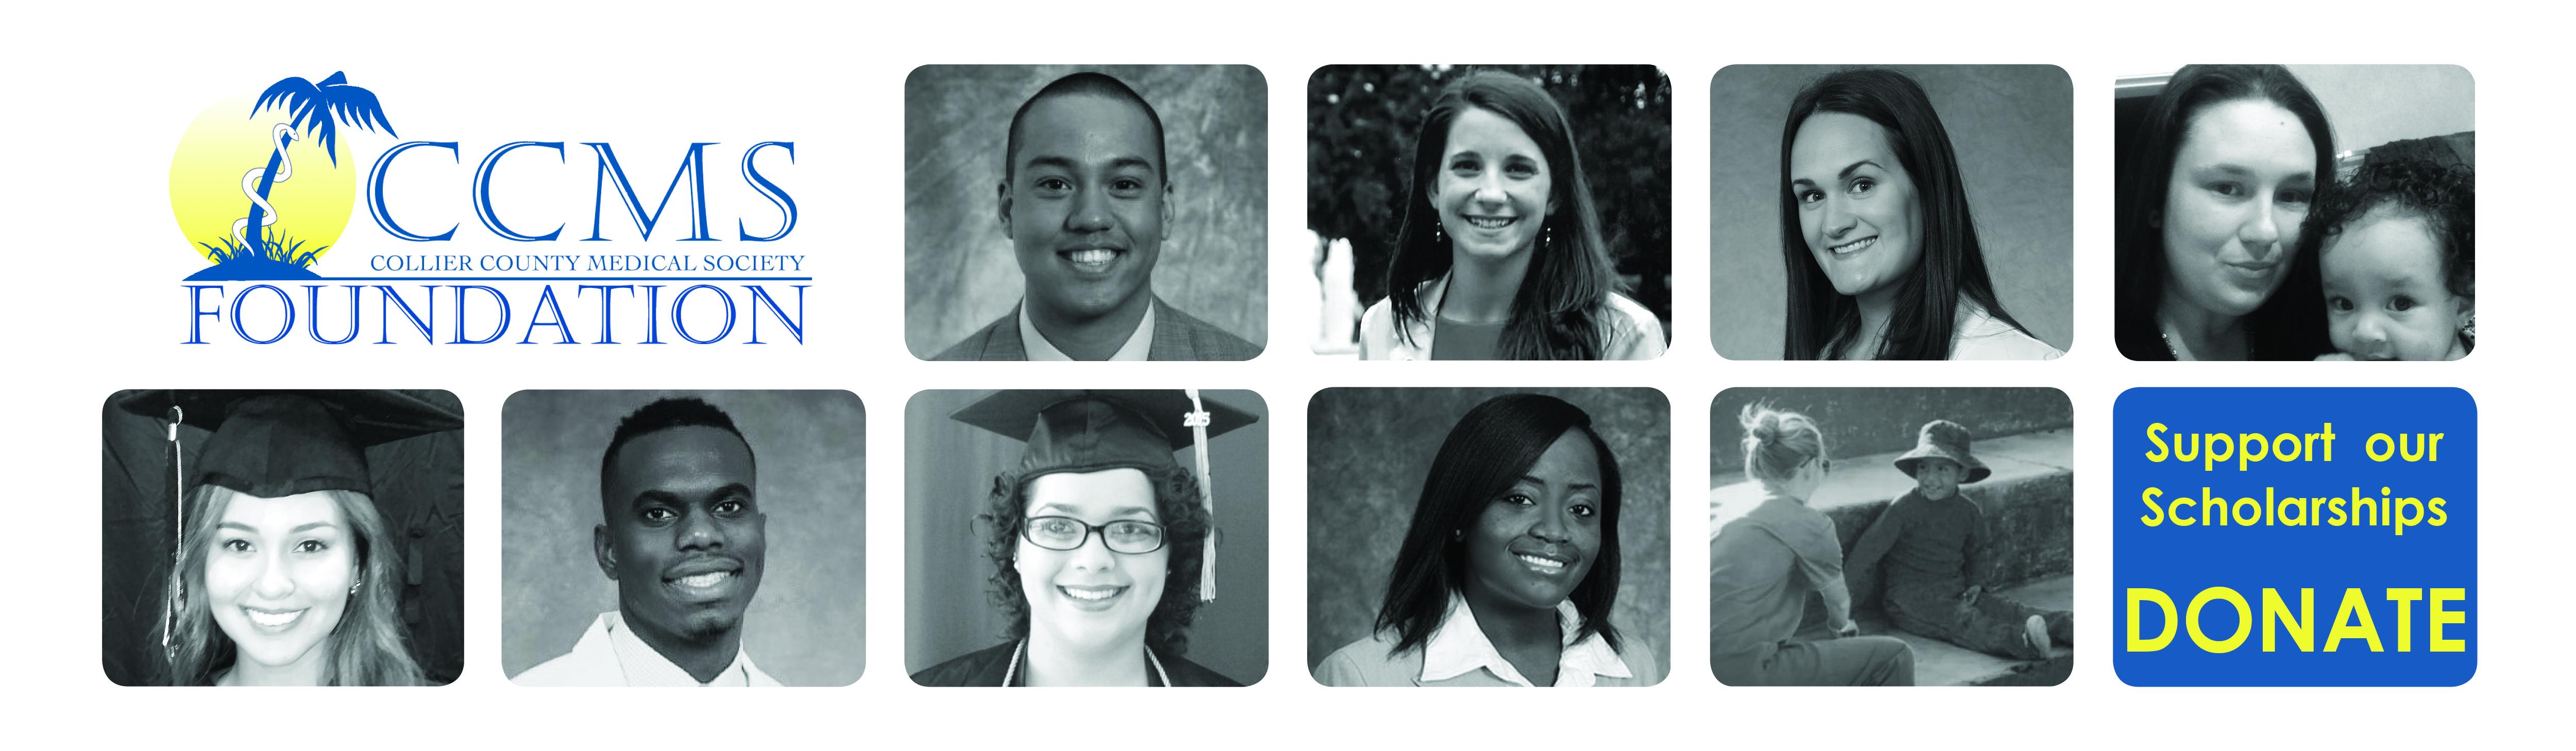 fccms-scholarships-web-banner2